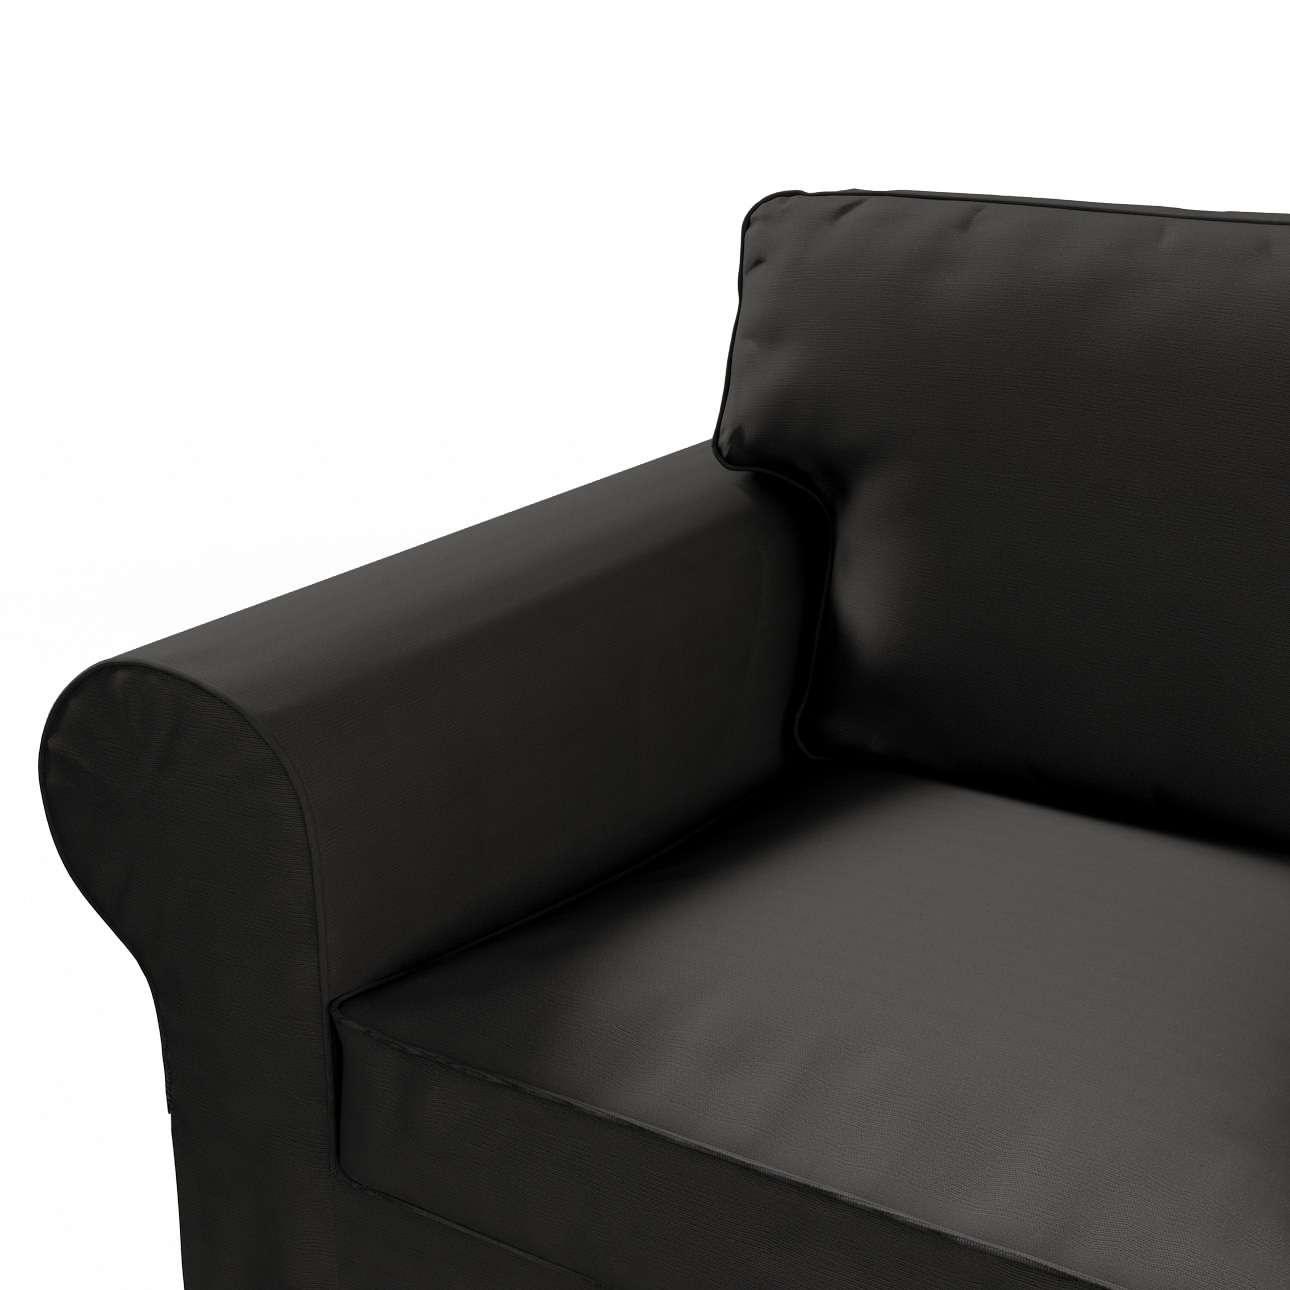 Ektorp 2-Sitzer Sofabezug nicht ausklappbar Sofabezug für  Ektorp 2-Sitzer nicht ausklappbar von der Kollektion Cotton Panama, Stoff: 702-08